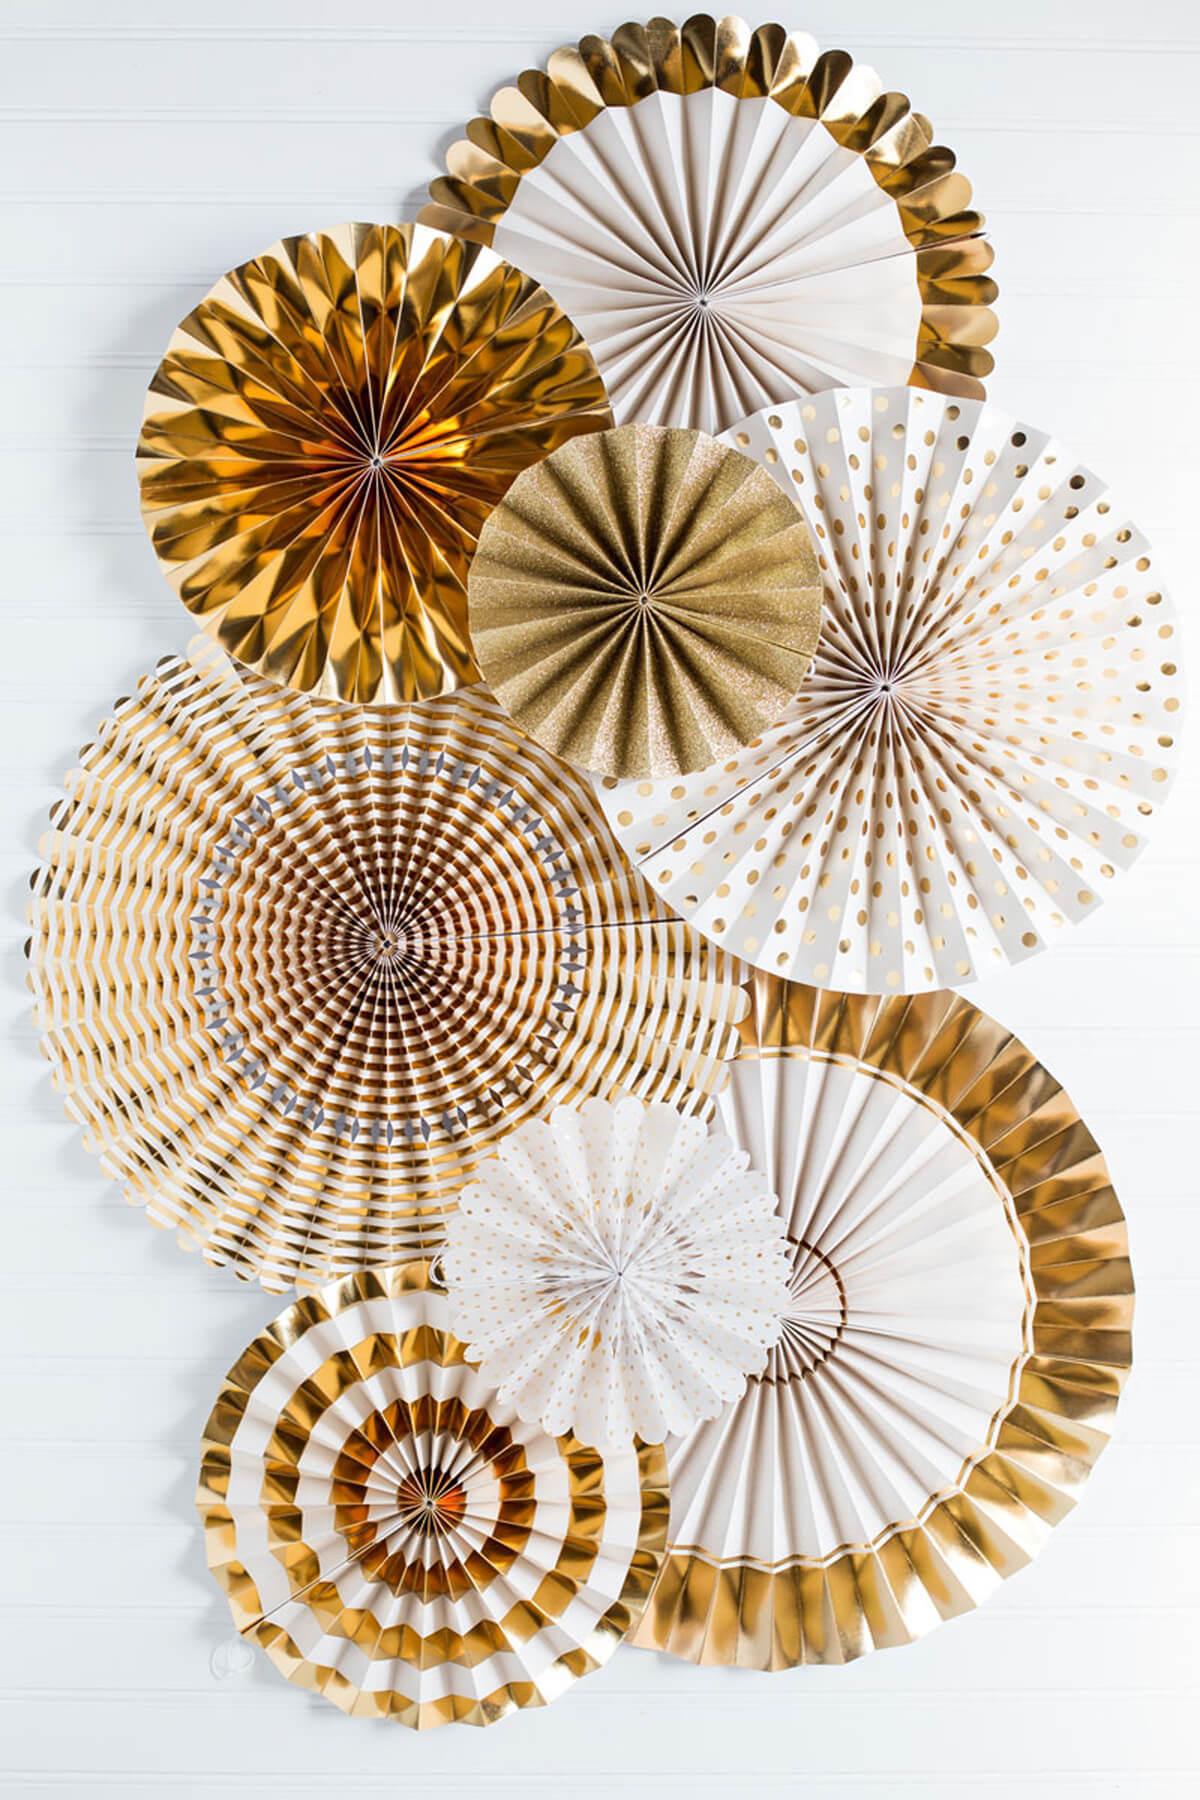 hanging chair range aeron desk fancy party fans rosette pinwheels gold & white, wedding decorations, 8 fans, mme